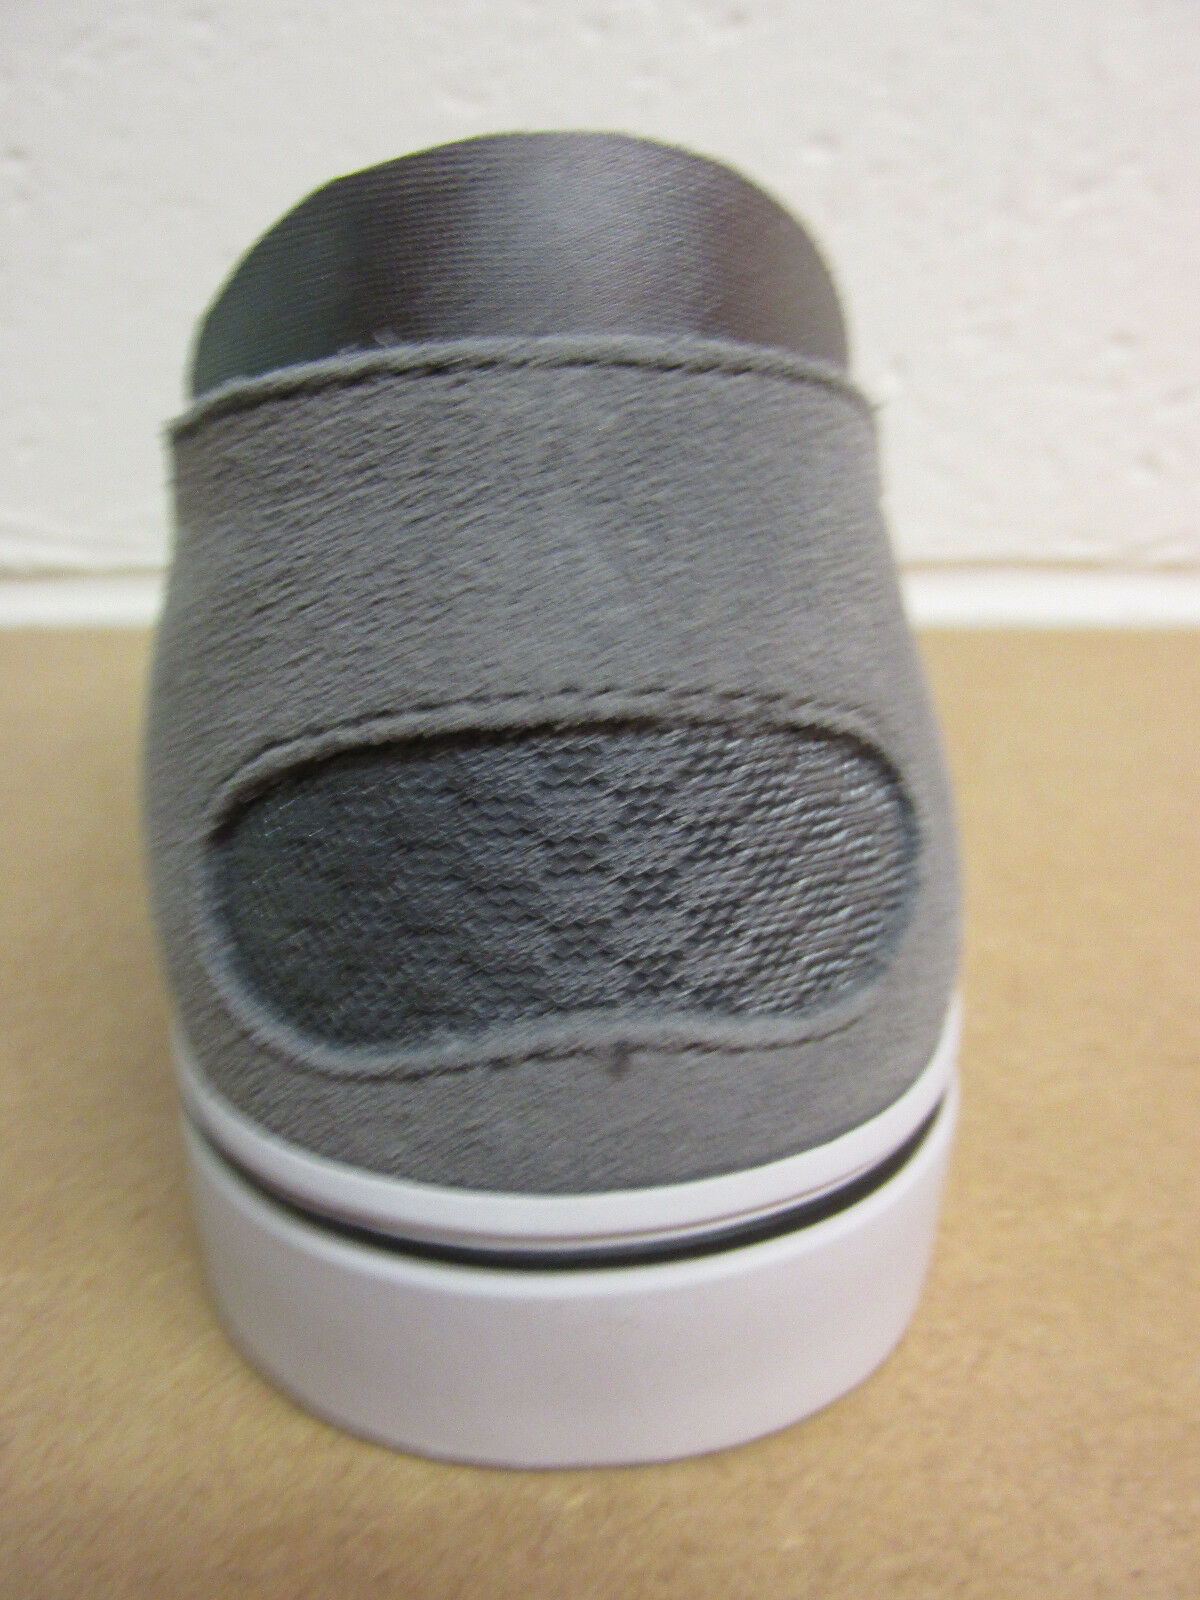 Nike Zoom Onehsot Sb Scarpe Sportive Uomo 724954 Tennis 010 Scarpe da Tennis 724954 d31fb3